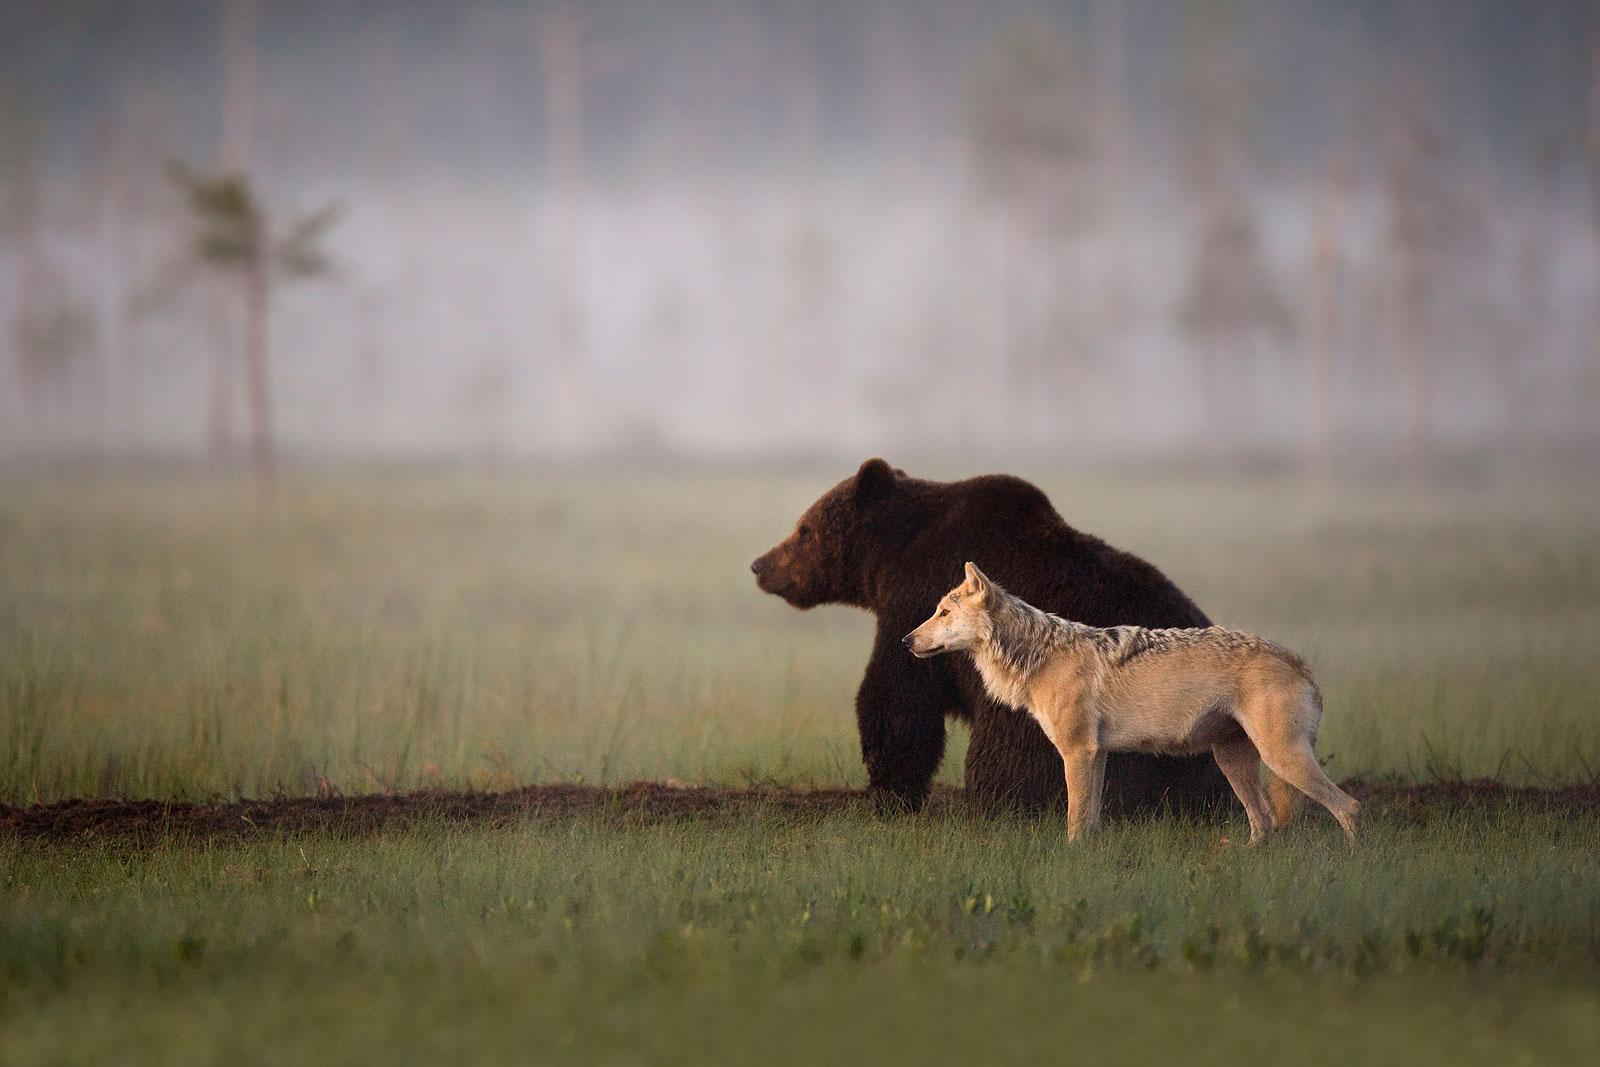 karhu susi ahma valokuvaus katselu wild taiga